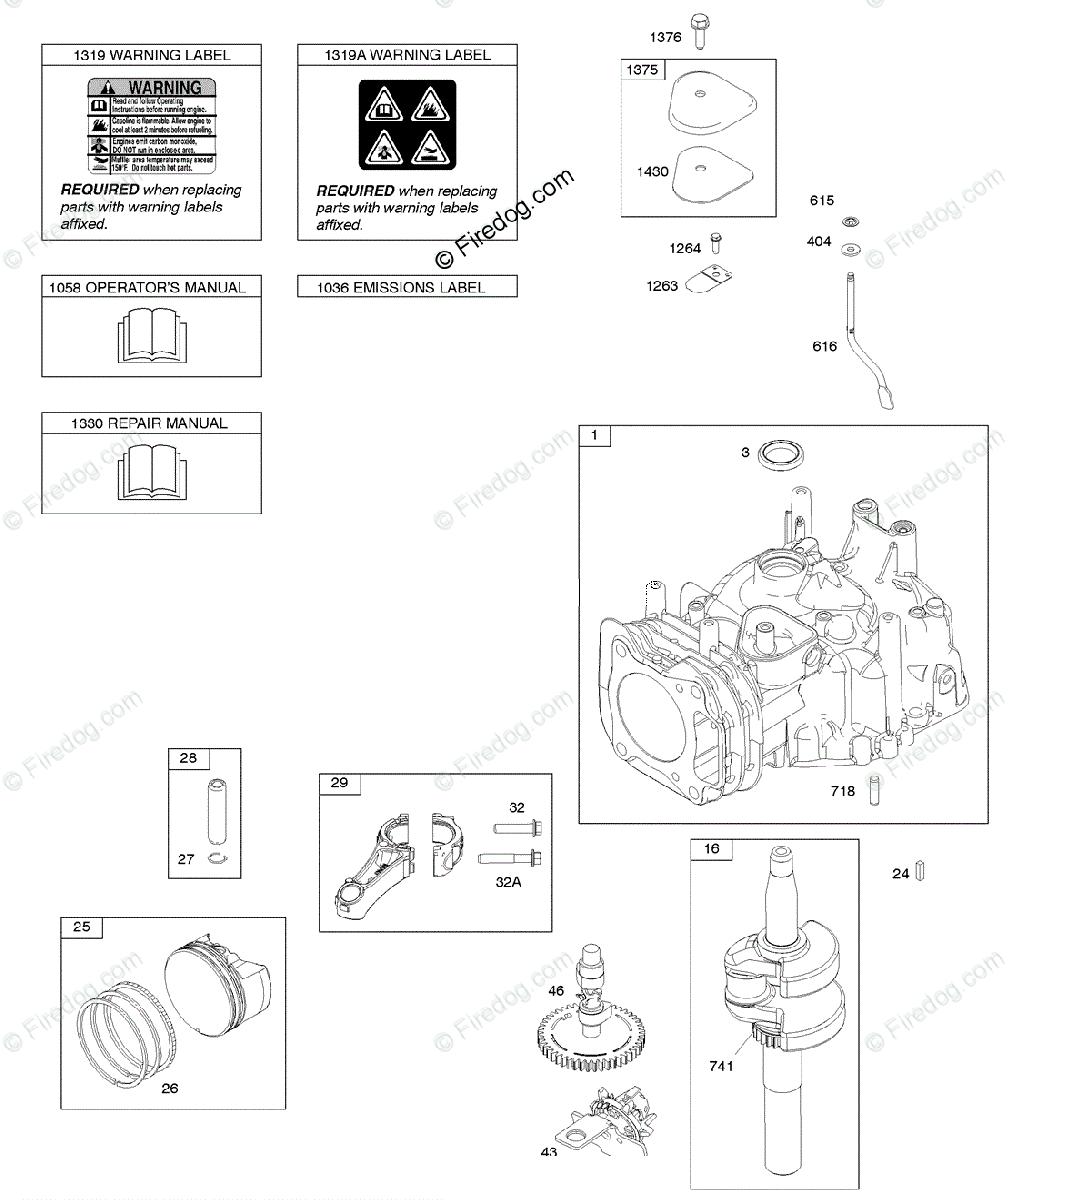 Briggs & Stratton 100000 - 19Z999 Series 11P900 to 11P999 OEM Parts